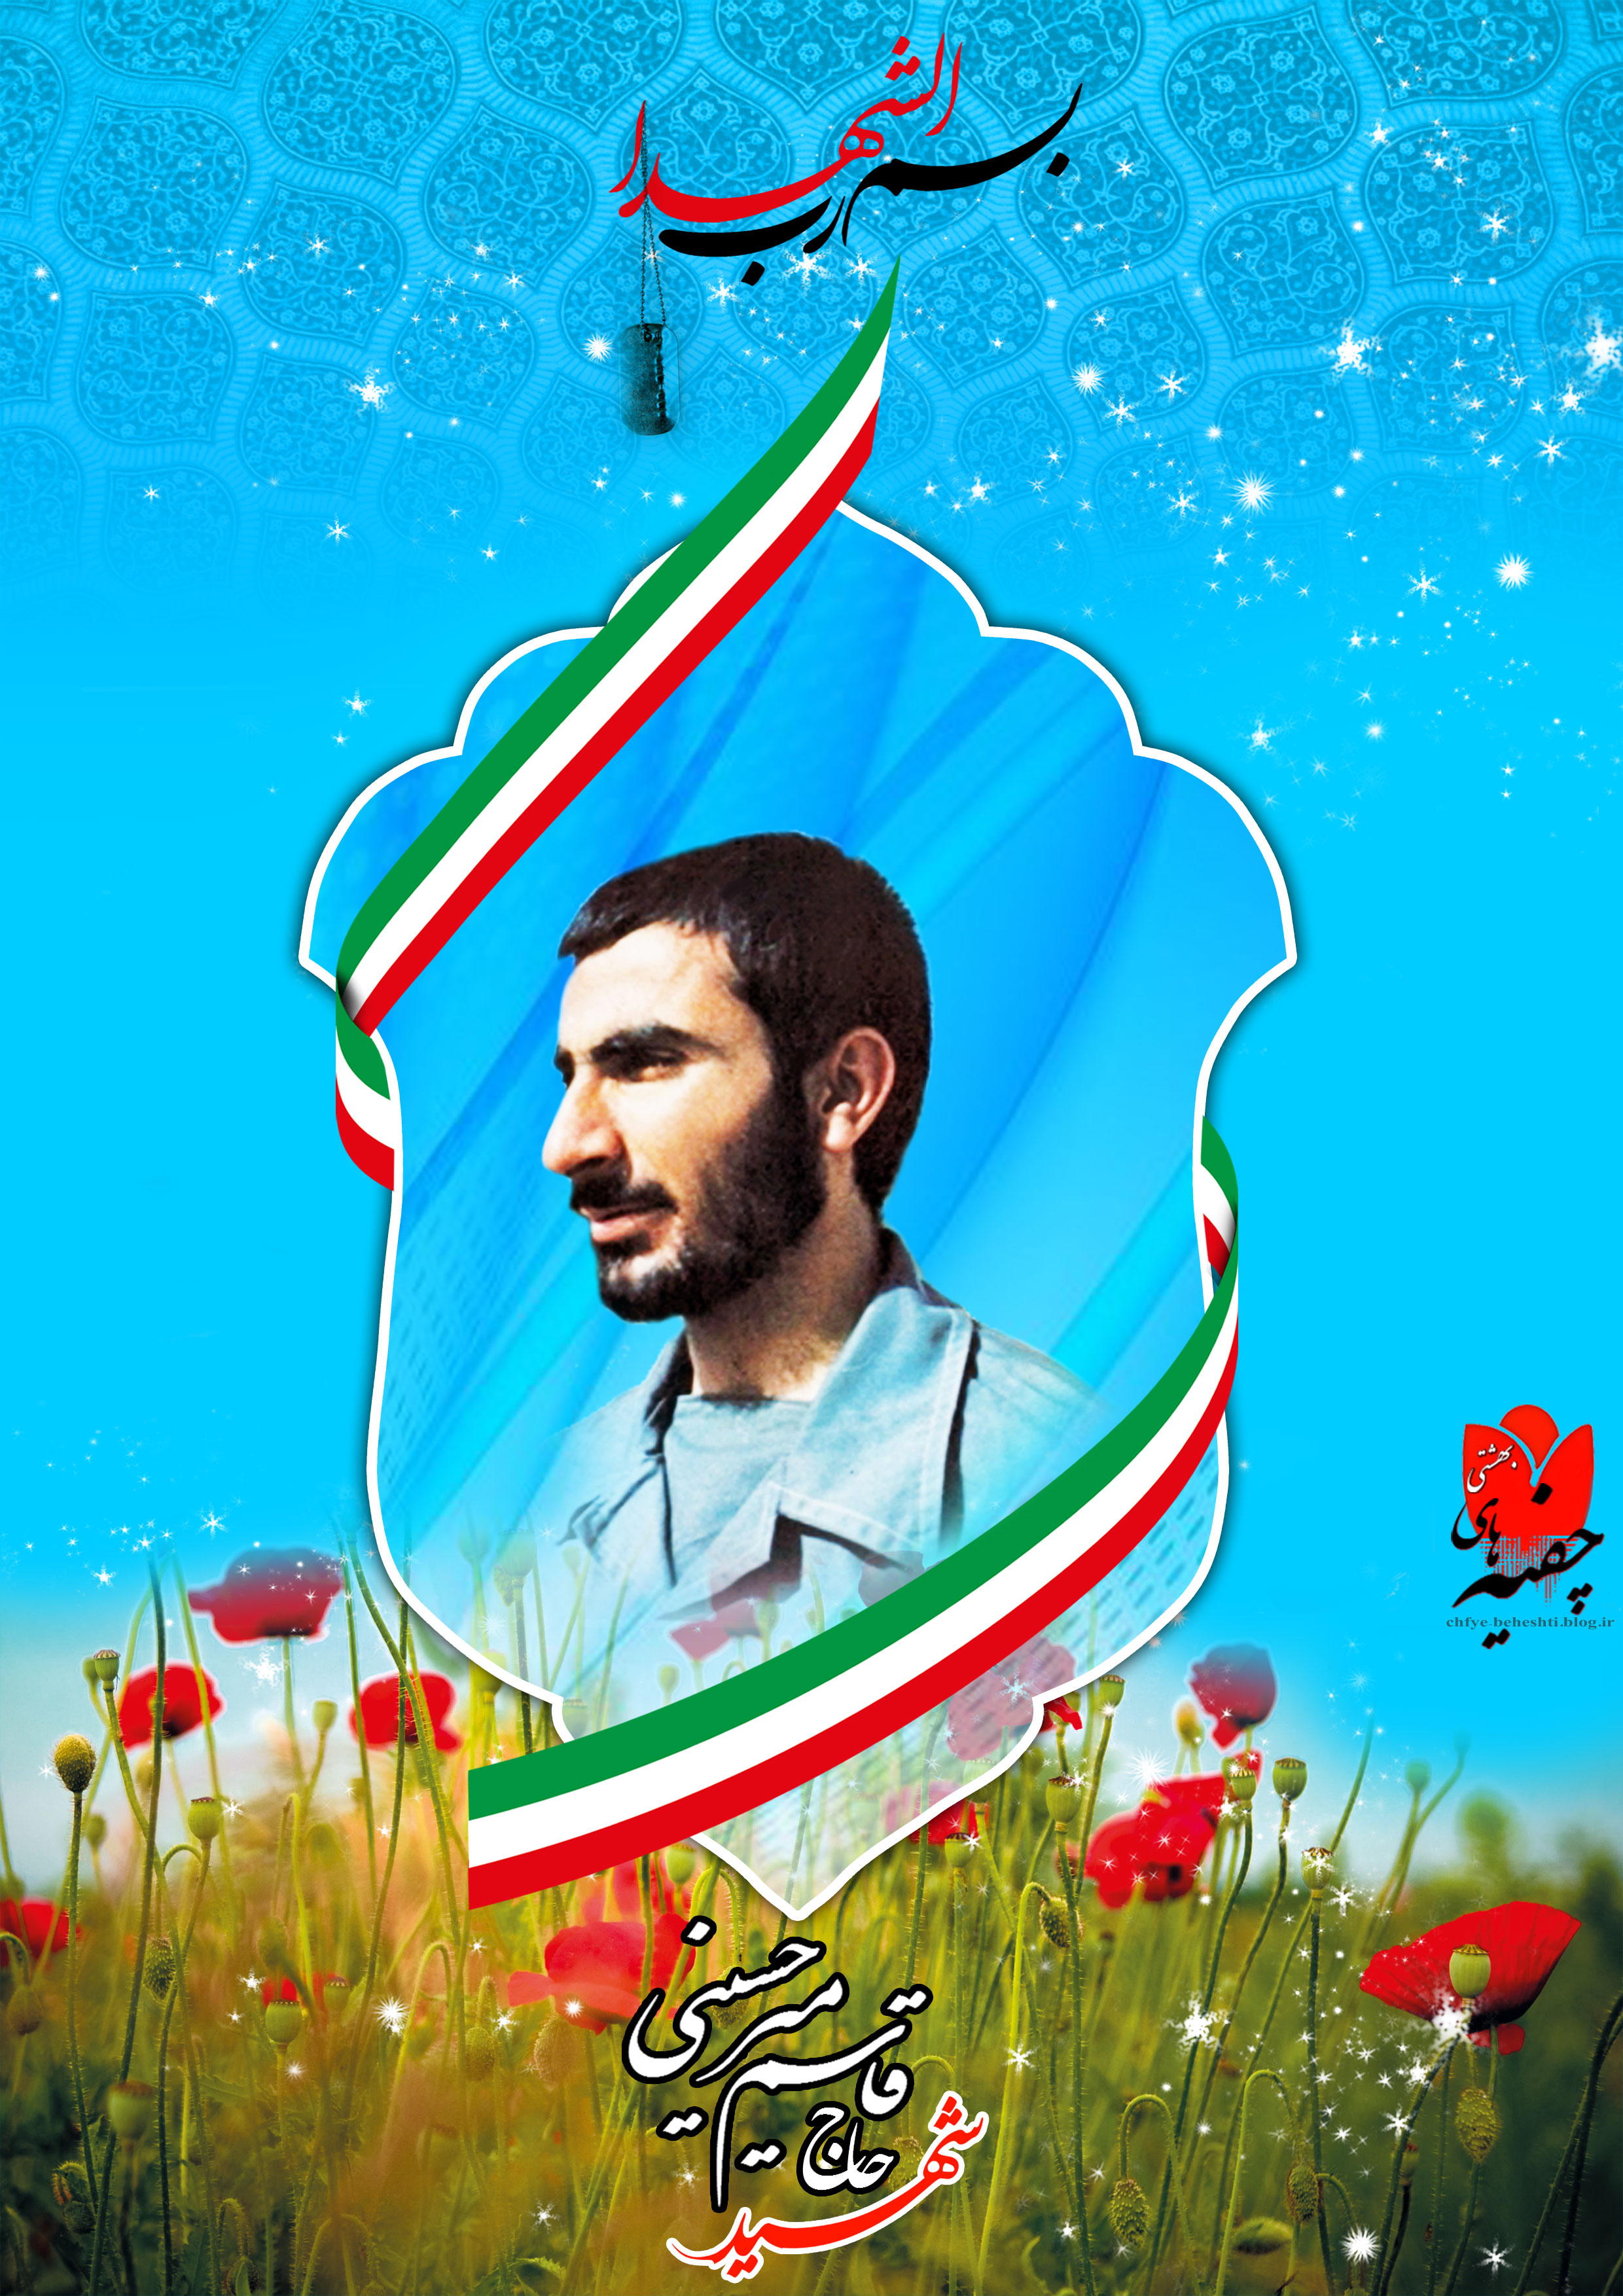 Haji Qasim, Mir-Hosseini-chfye-beheshti.jpg